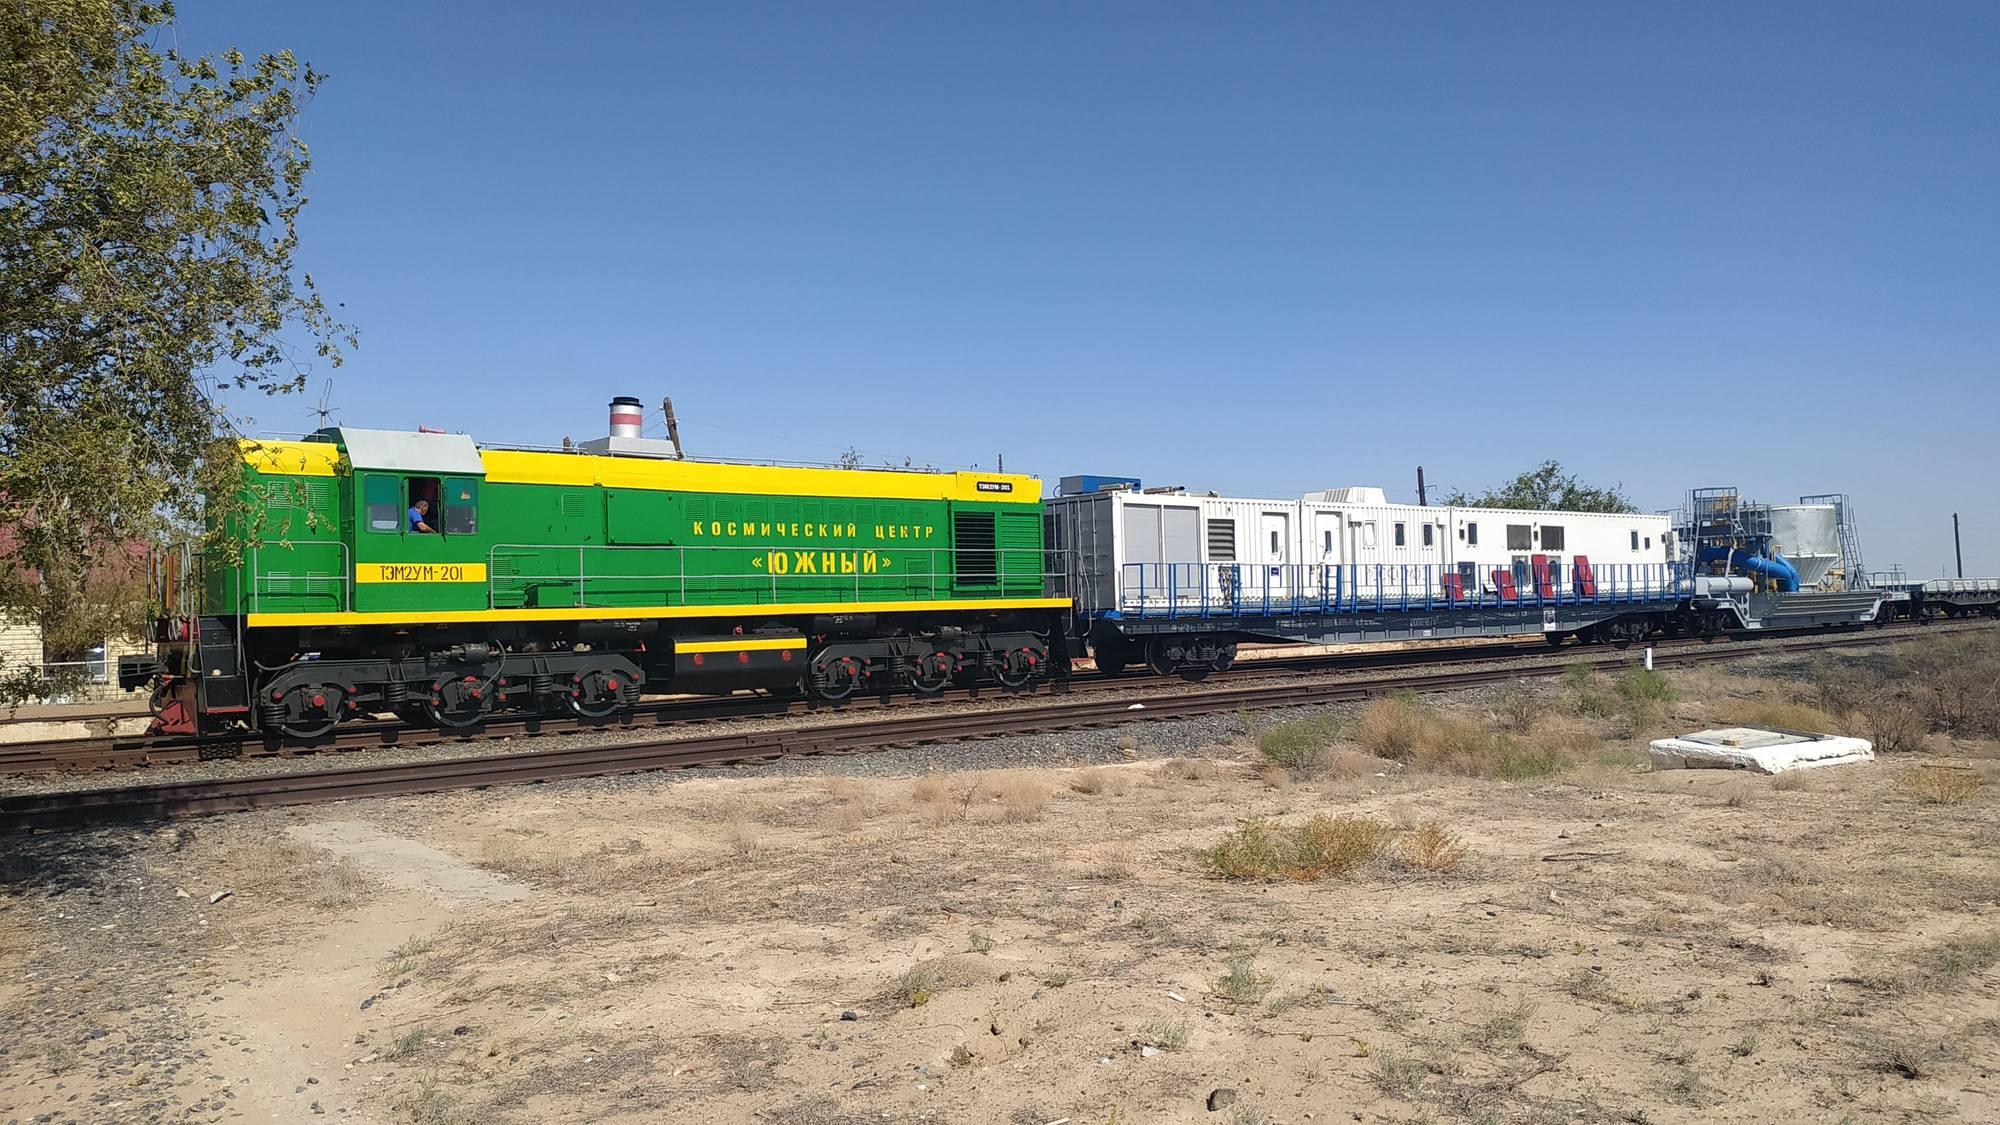 Locomotive diesel pour ce convoi ferroviaire.